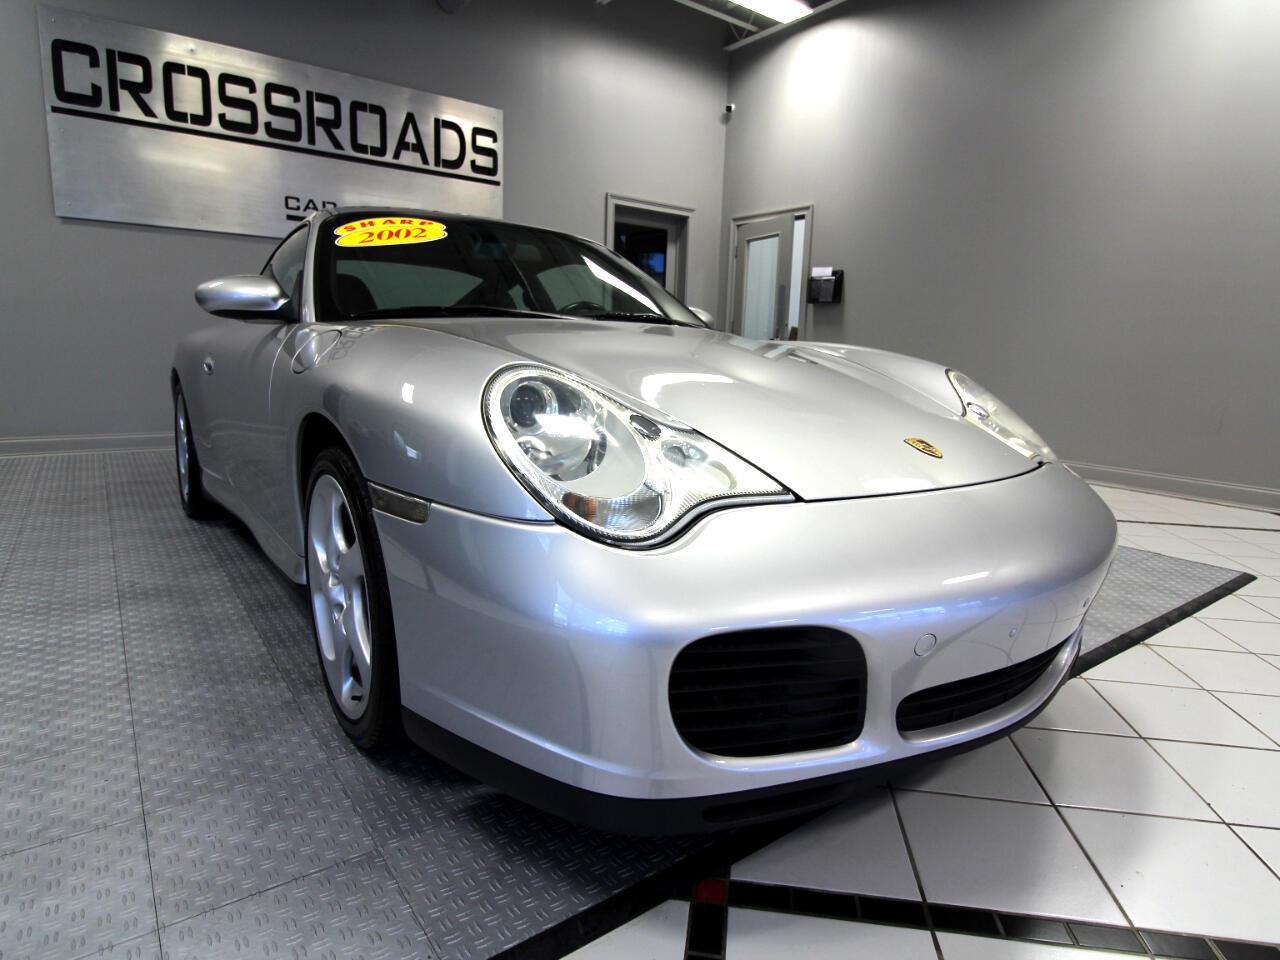 2002 Porsche 911 Carrera 2dr Carrera 4 S Cpe 6-Spd Manual